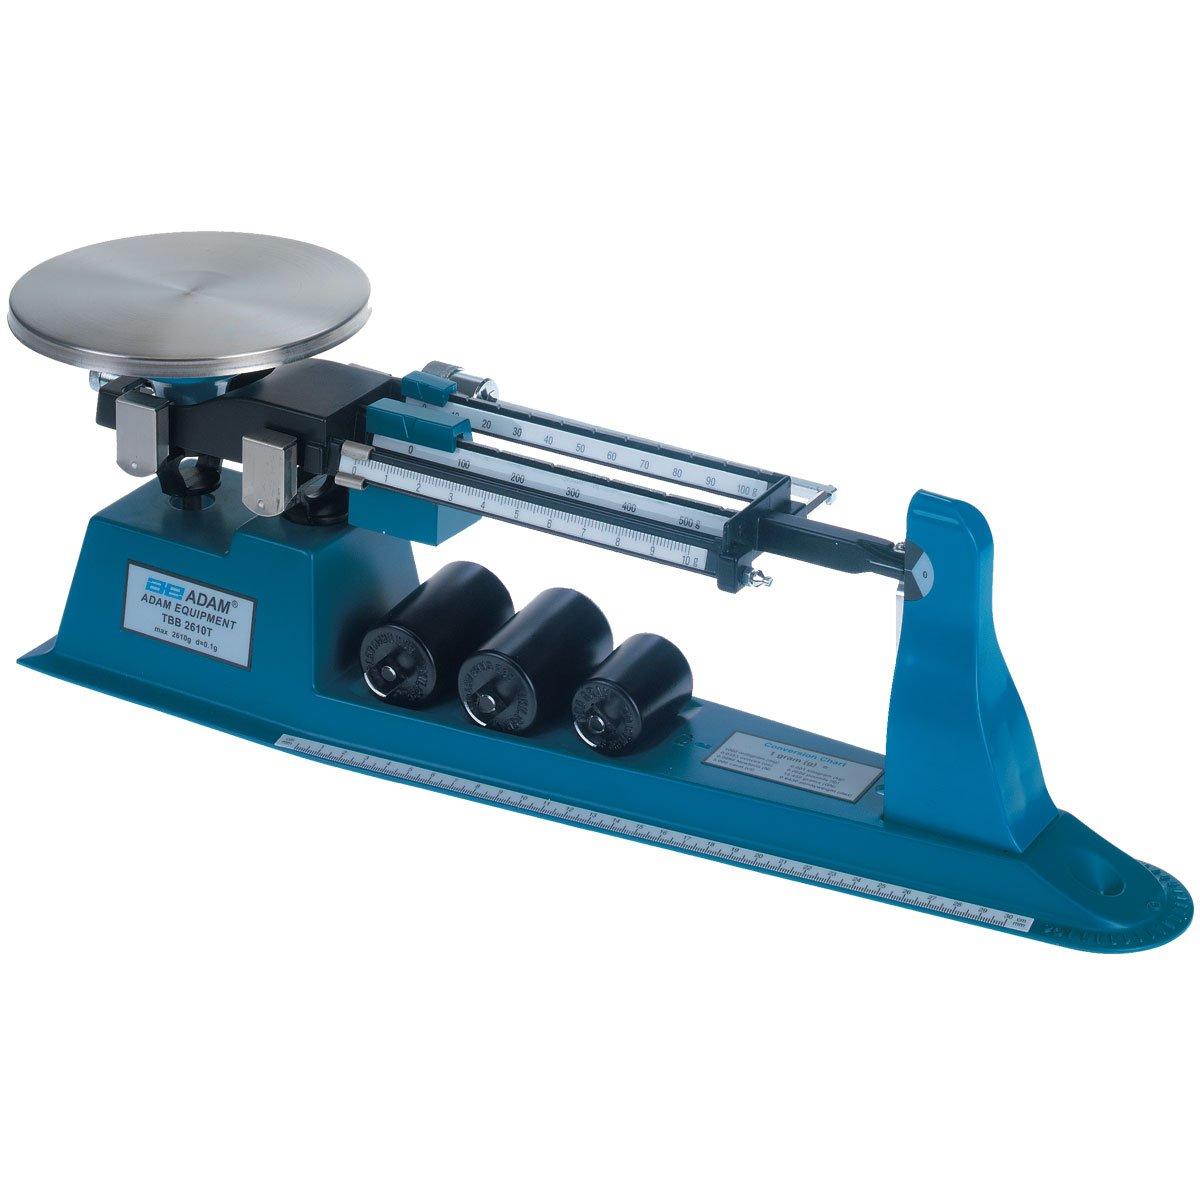 Adam Equipment TBB 2610S Triple Beam Mechanical Balance, 2610g Capacity, 0.1g Readability